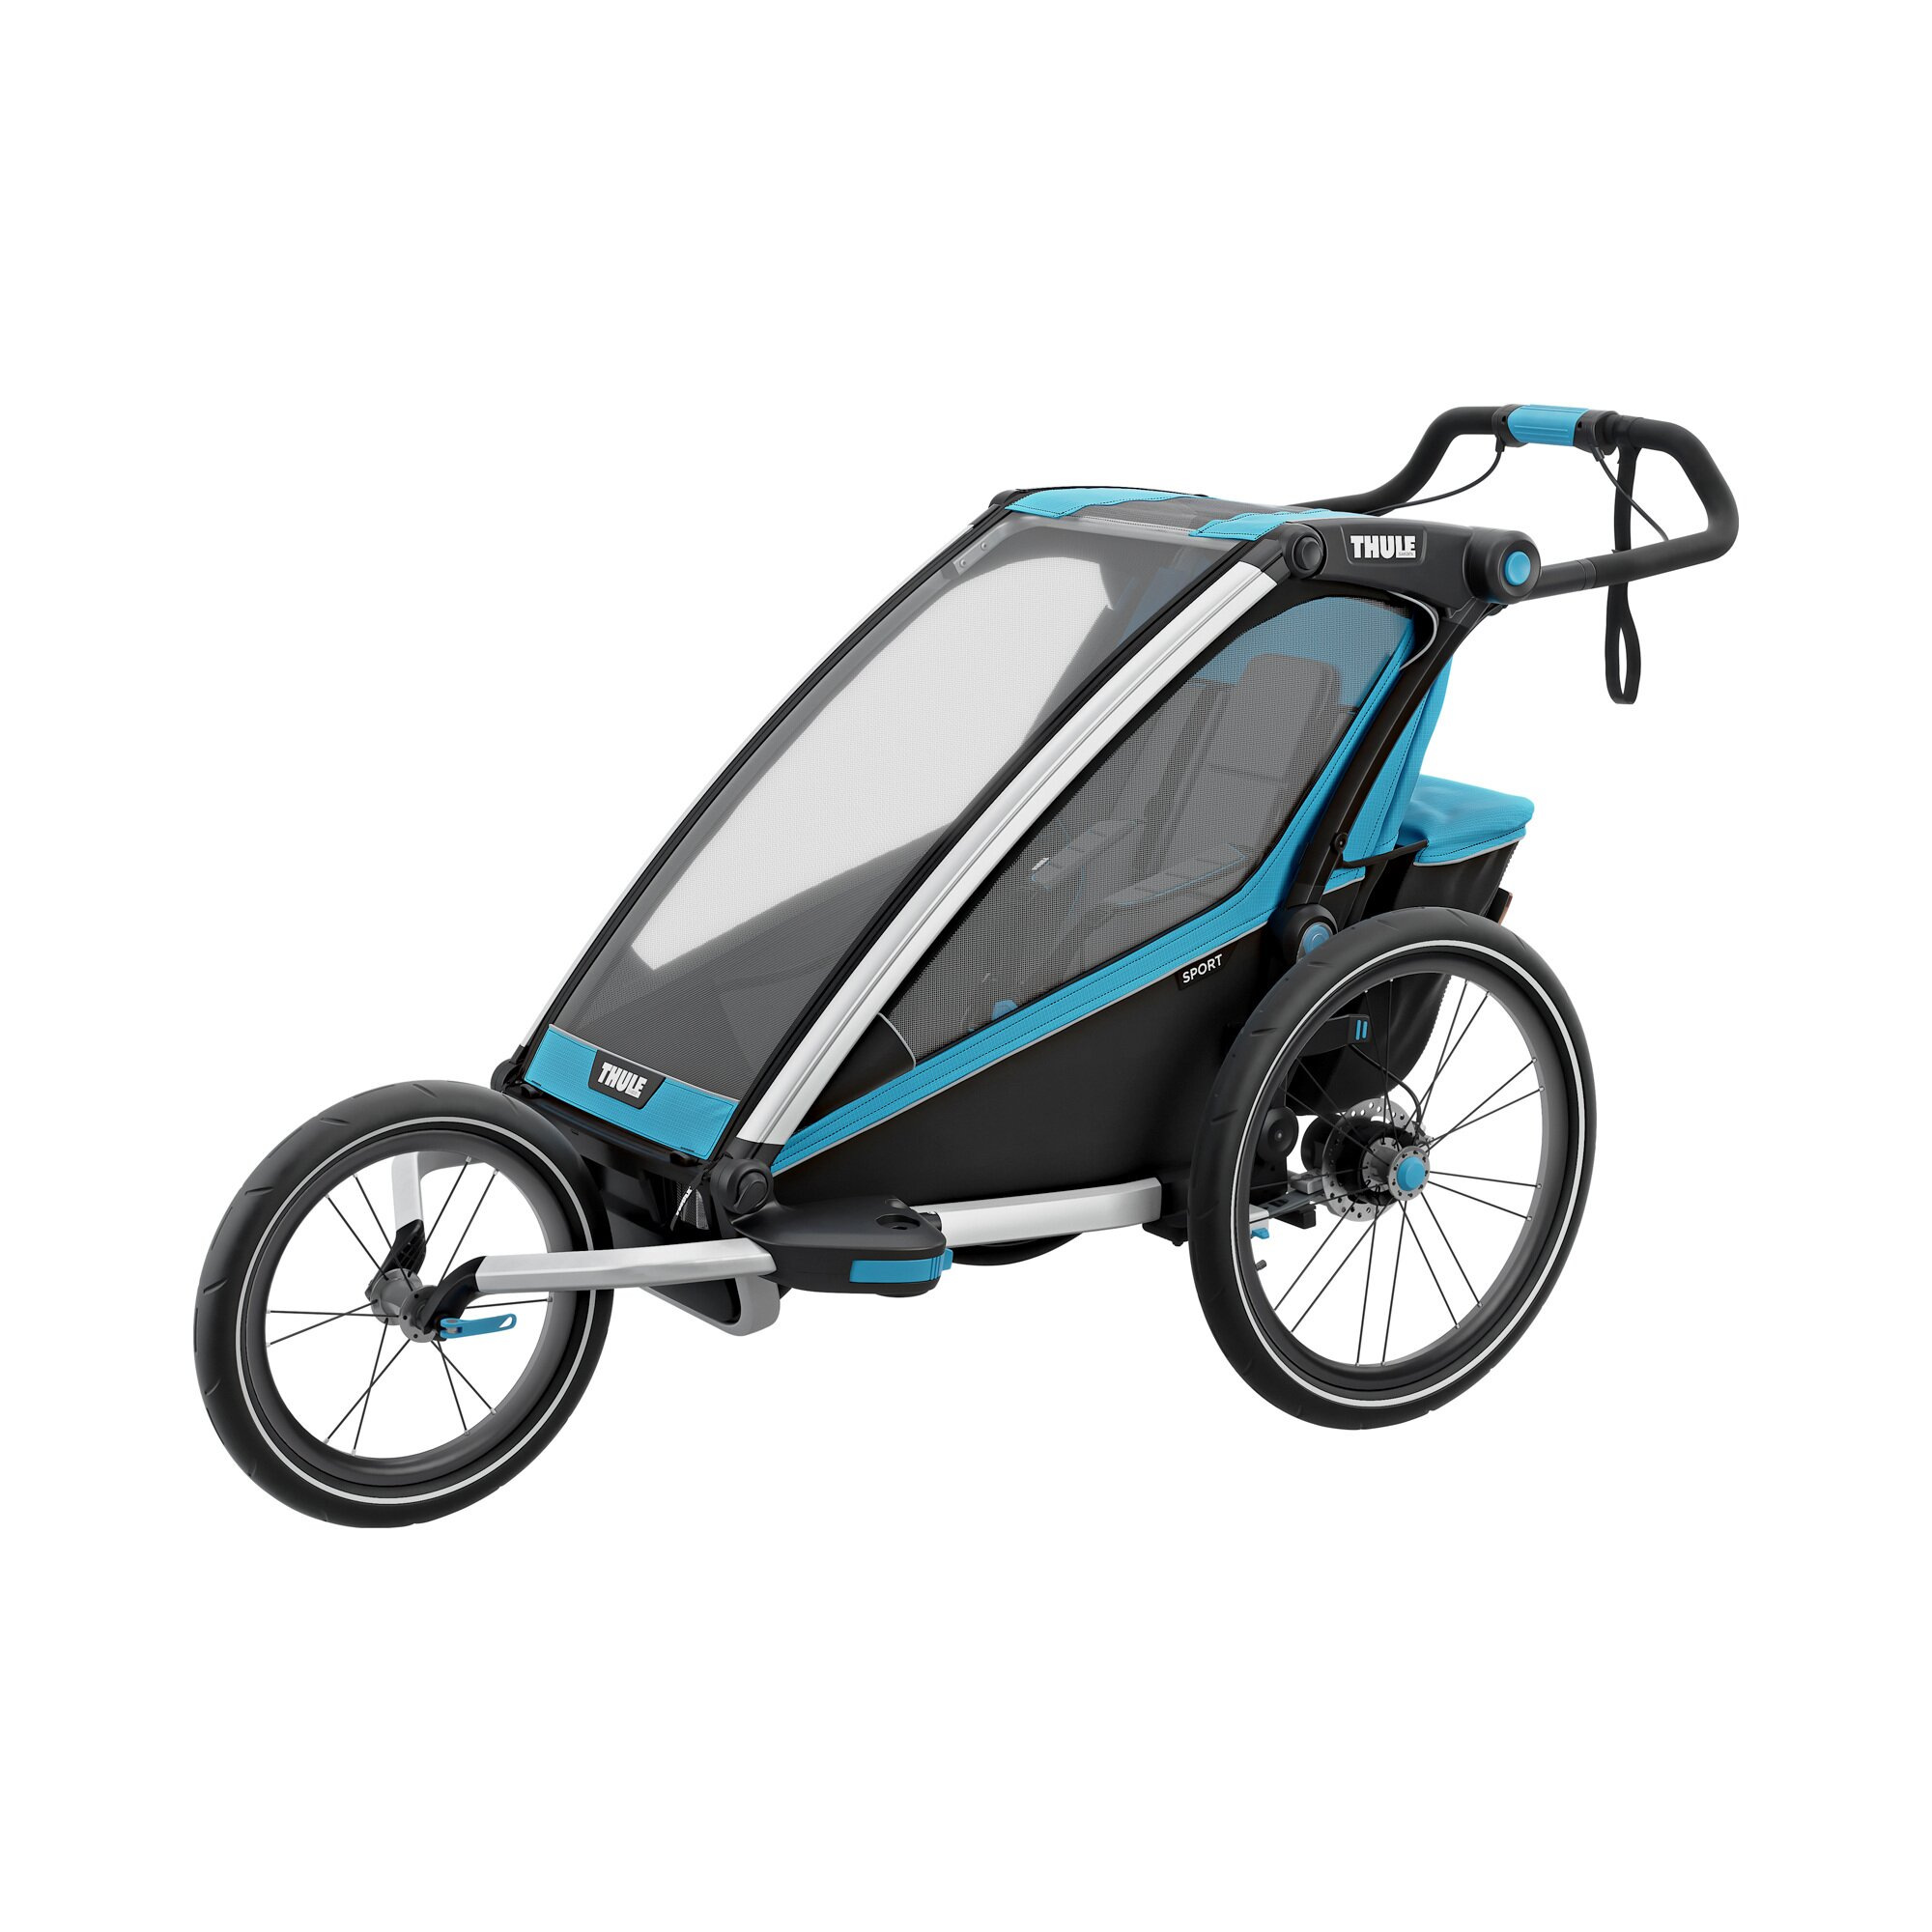 thule-chariot-sport-1-fahrradanhanger-blau